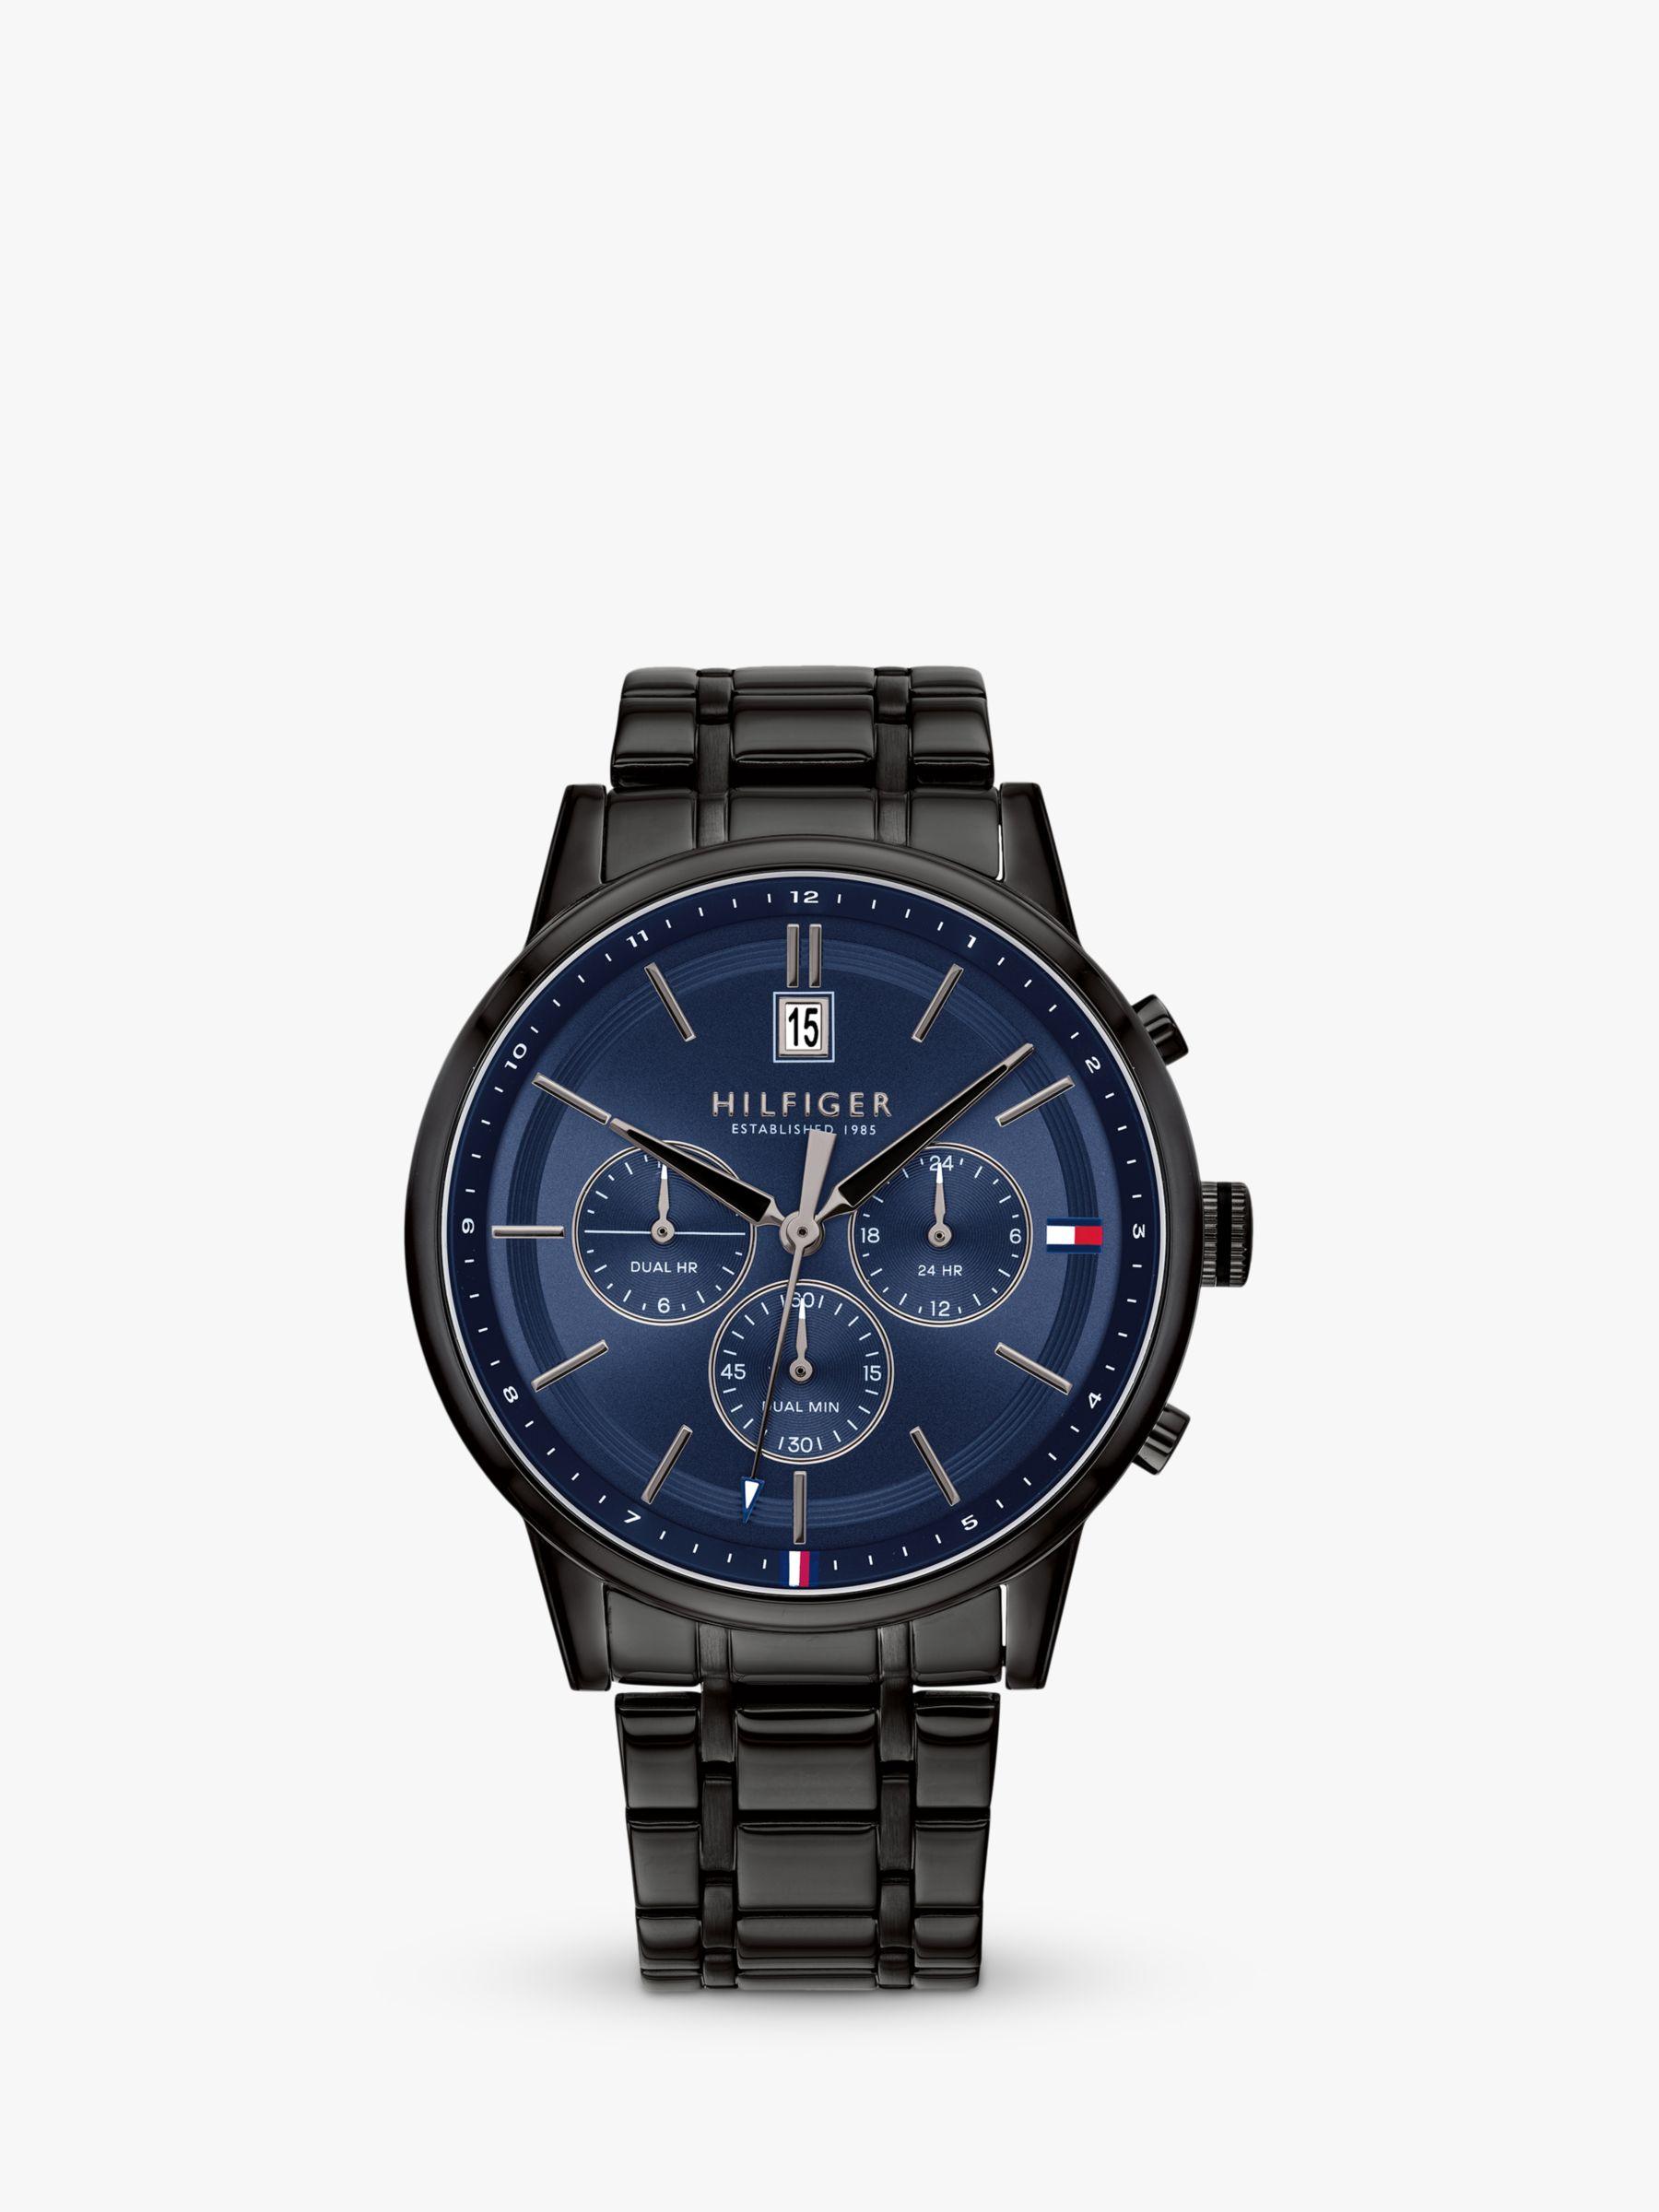 a4b64dacf3407 Tommy Hilfiger Men's Kyle Date Chronograph Bracelet Strap Watch, Black/Blue  1791633